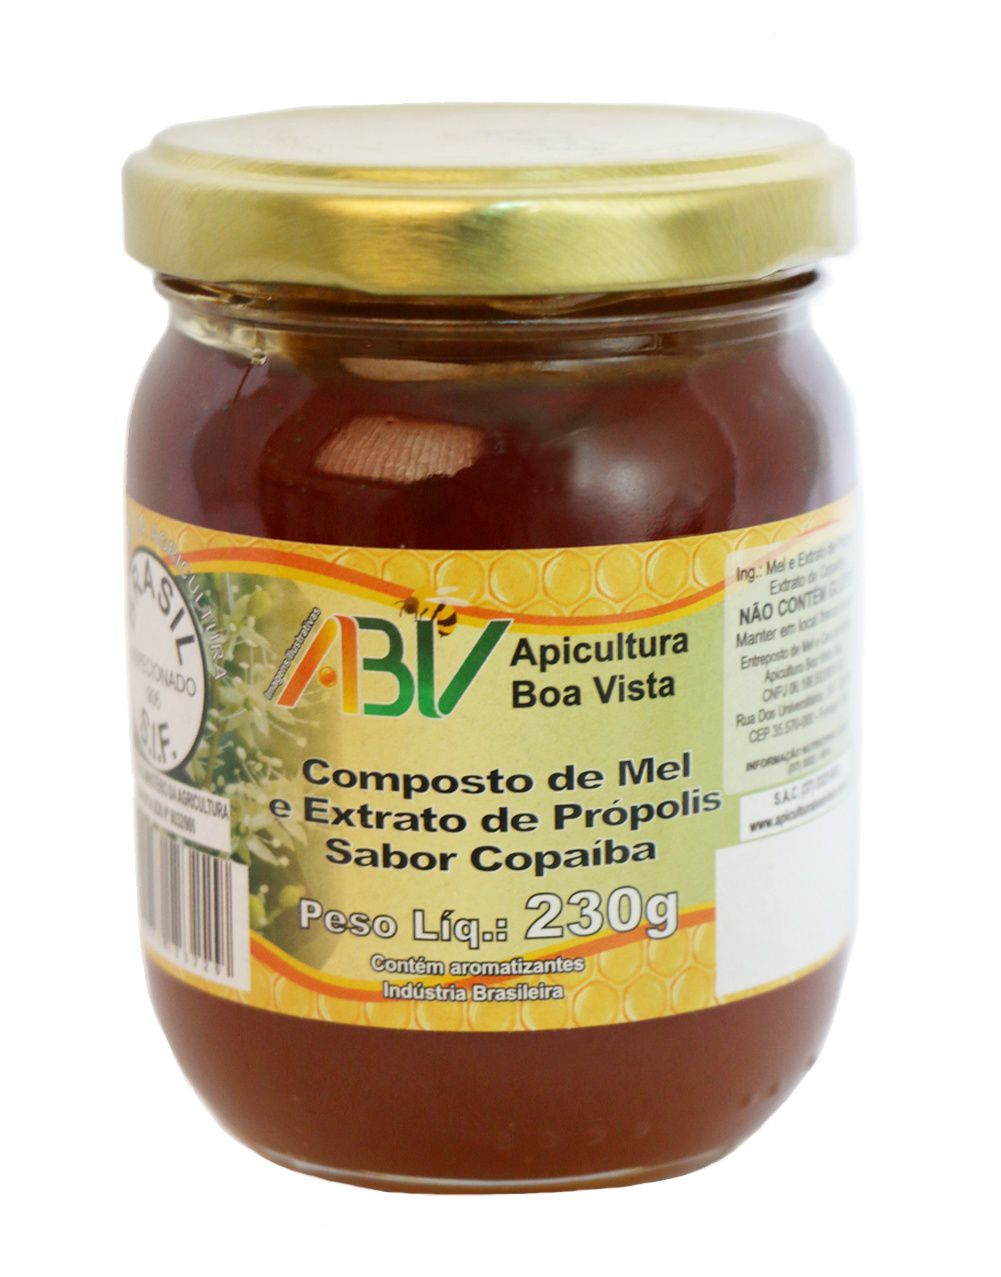 Composto de mel e extrato de própolis sabor copaíba pote vidro 230g